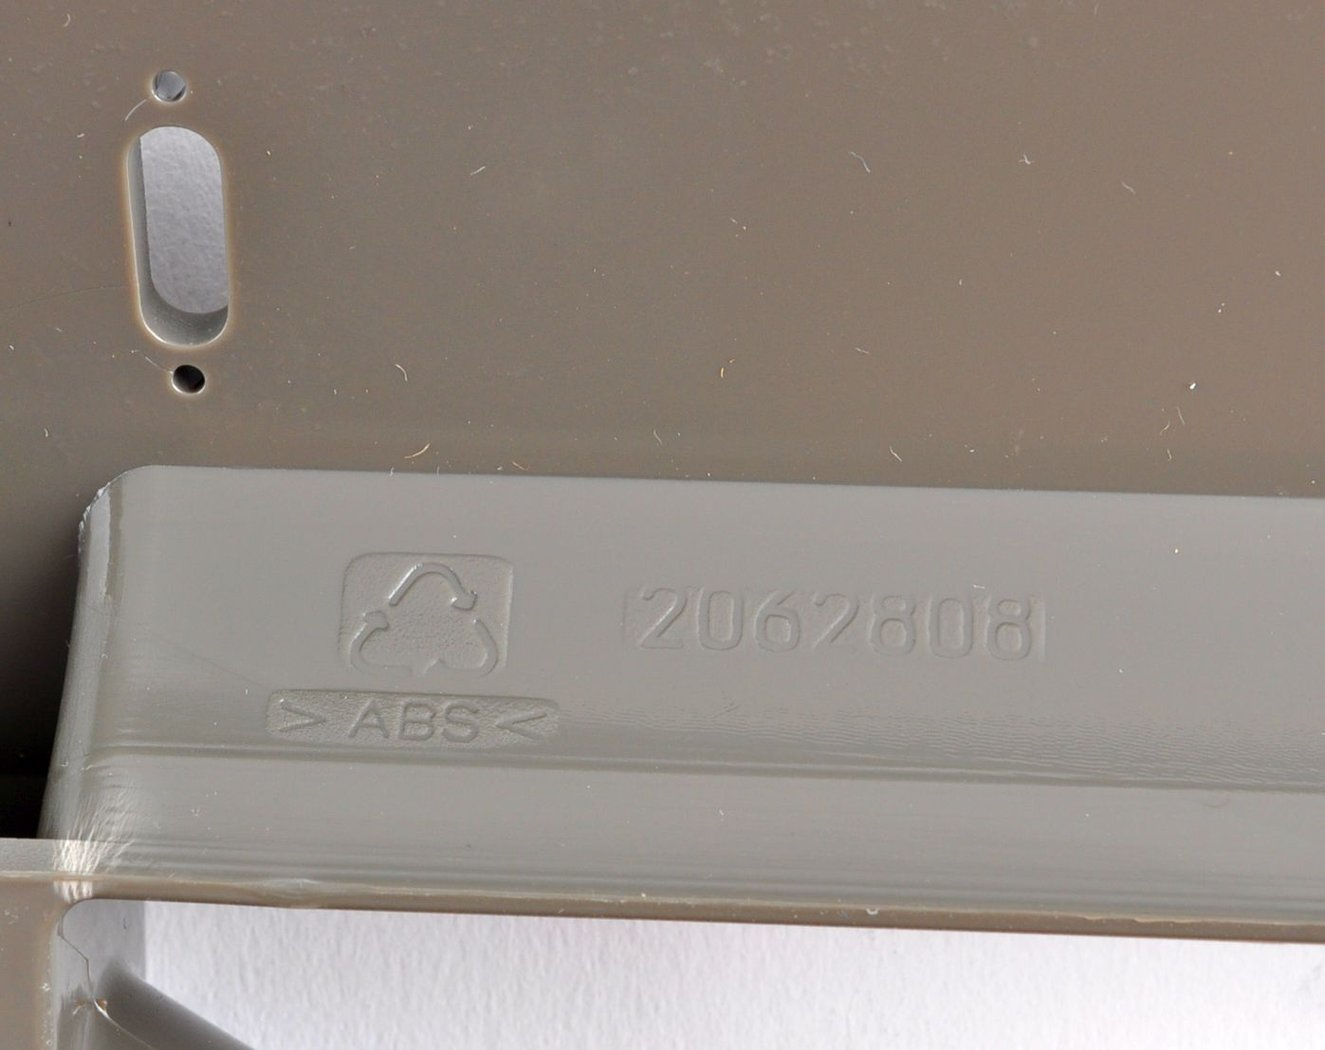 Aeg Kühlschrank Produktnummer : Aeg zanussi privileg kühlschrank türgriff gefrierschrank